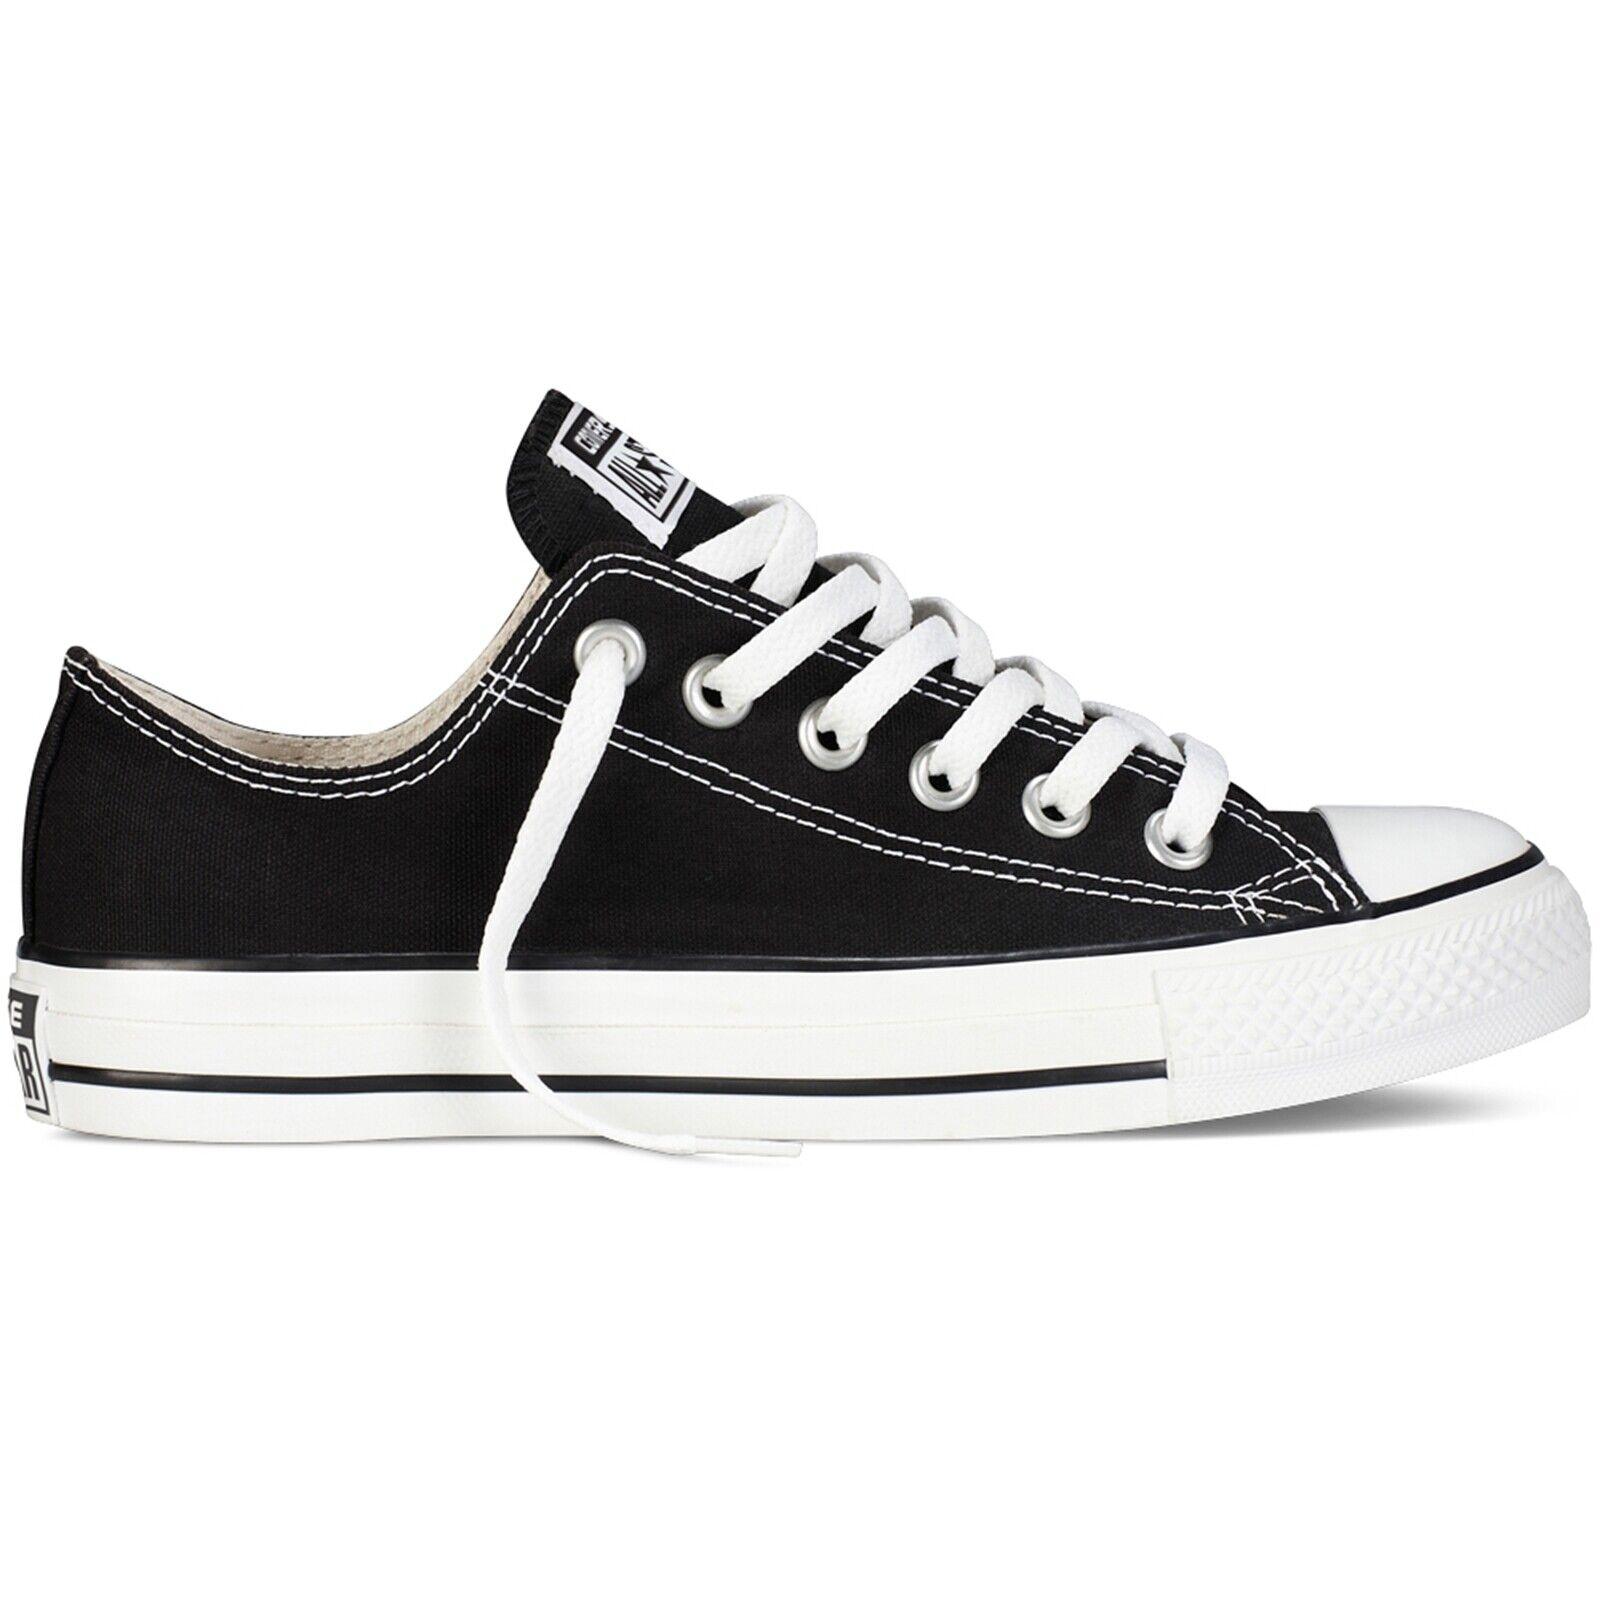 baskets CONVERSE Chuck TaylorAll Star chaussures Basse hommes femmes M9166C noir